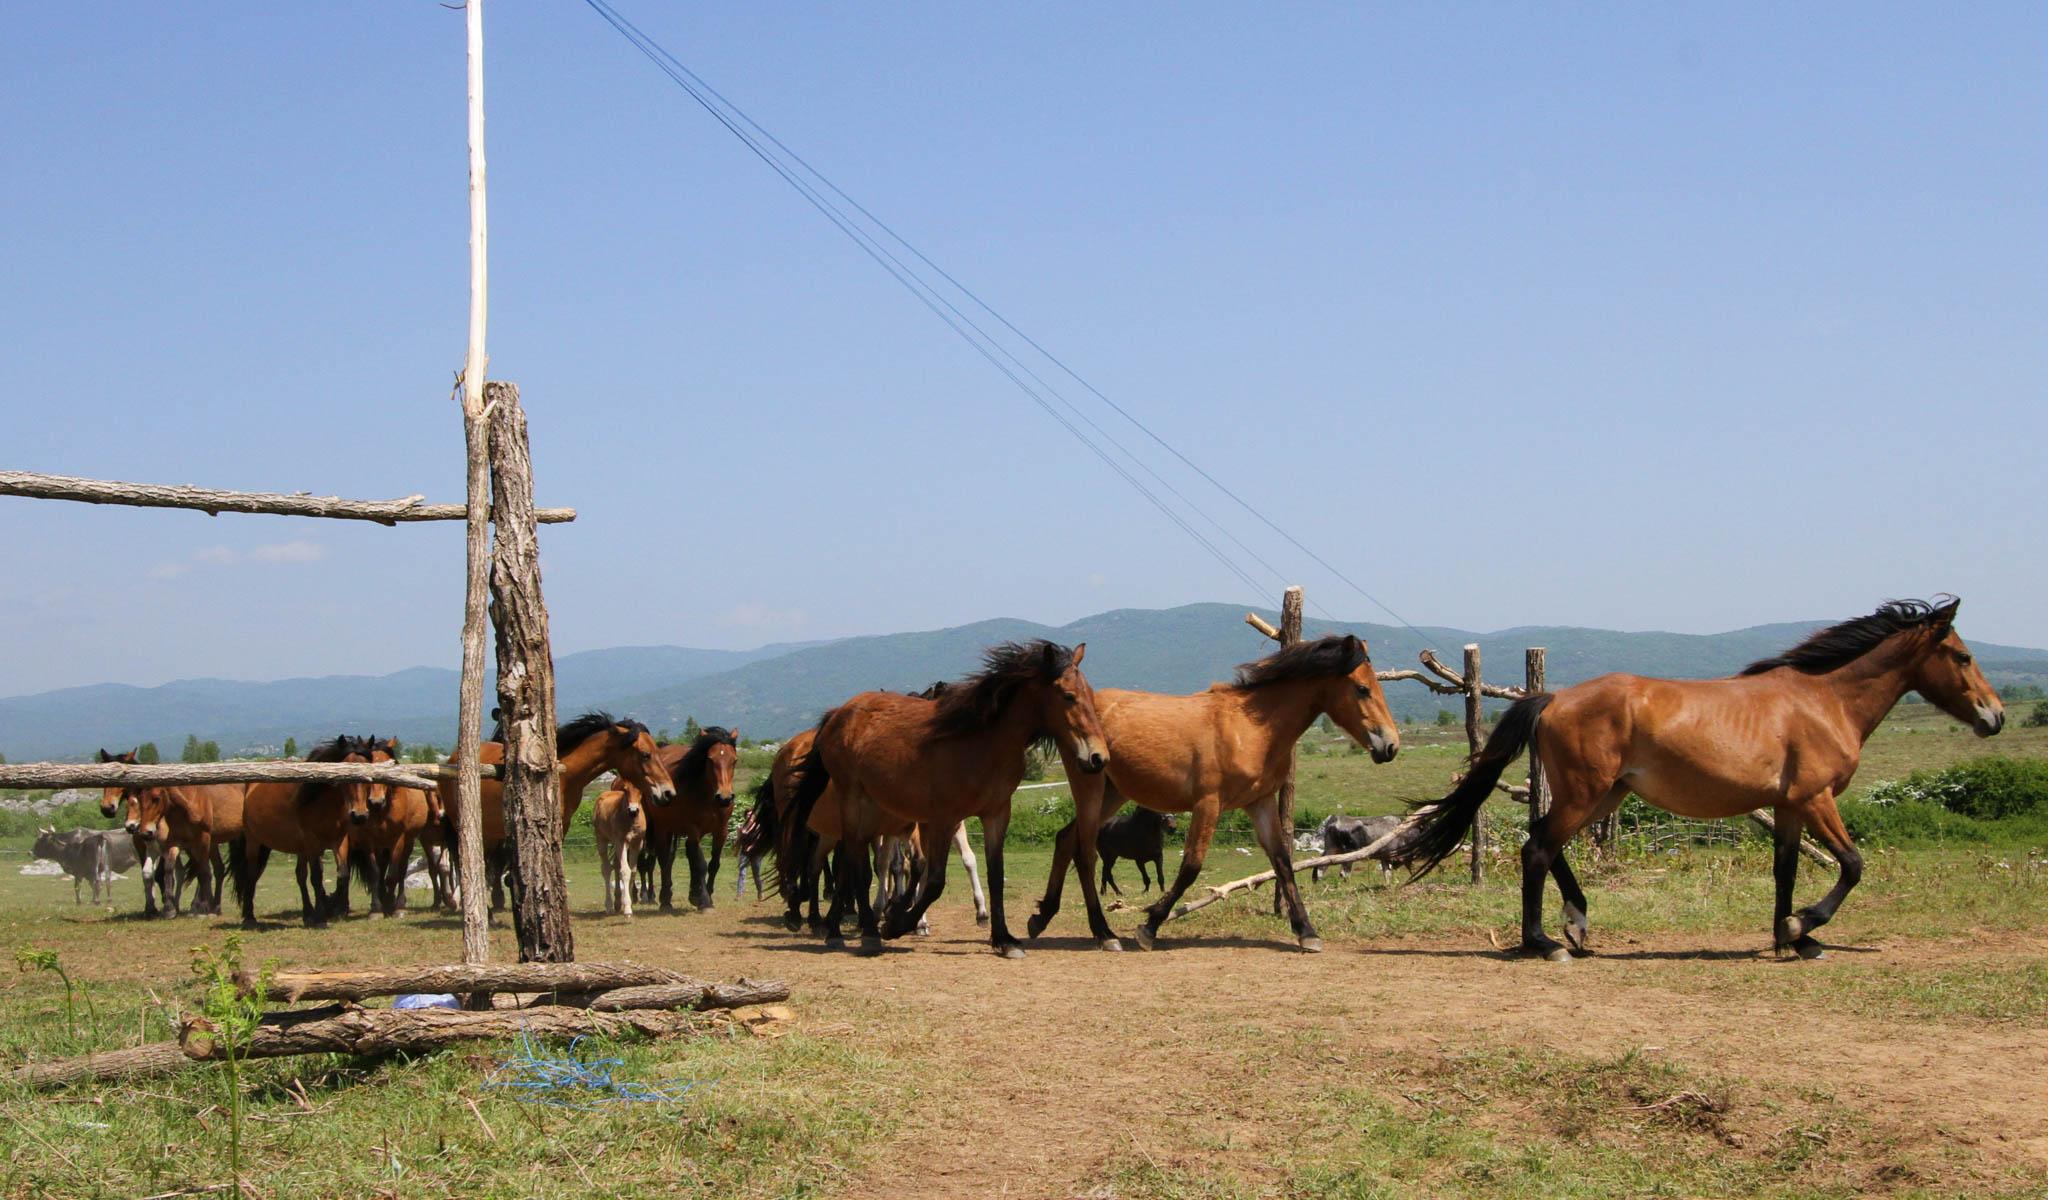 Wild Bosnian mountain horse release in the Velebit rewilding area, on May 19, 2015